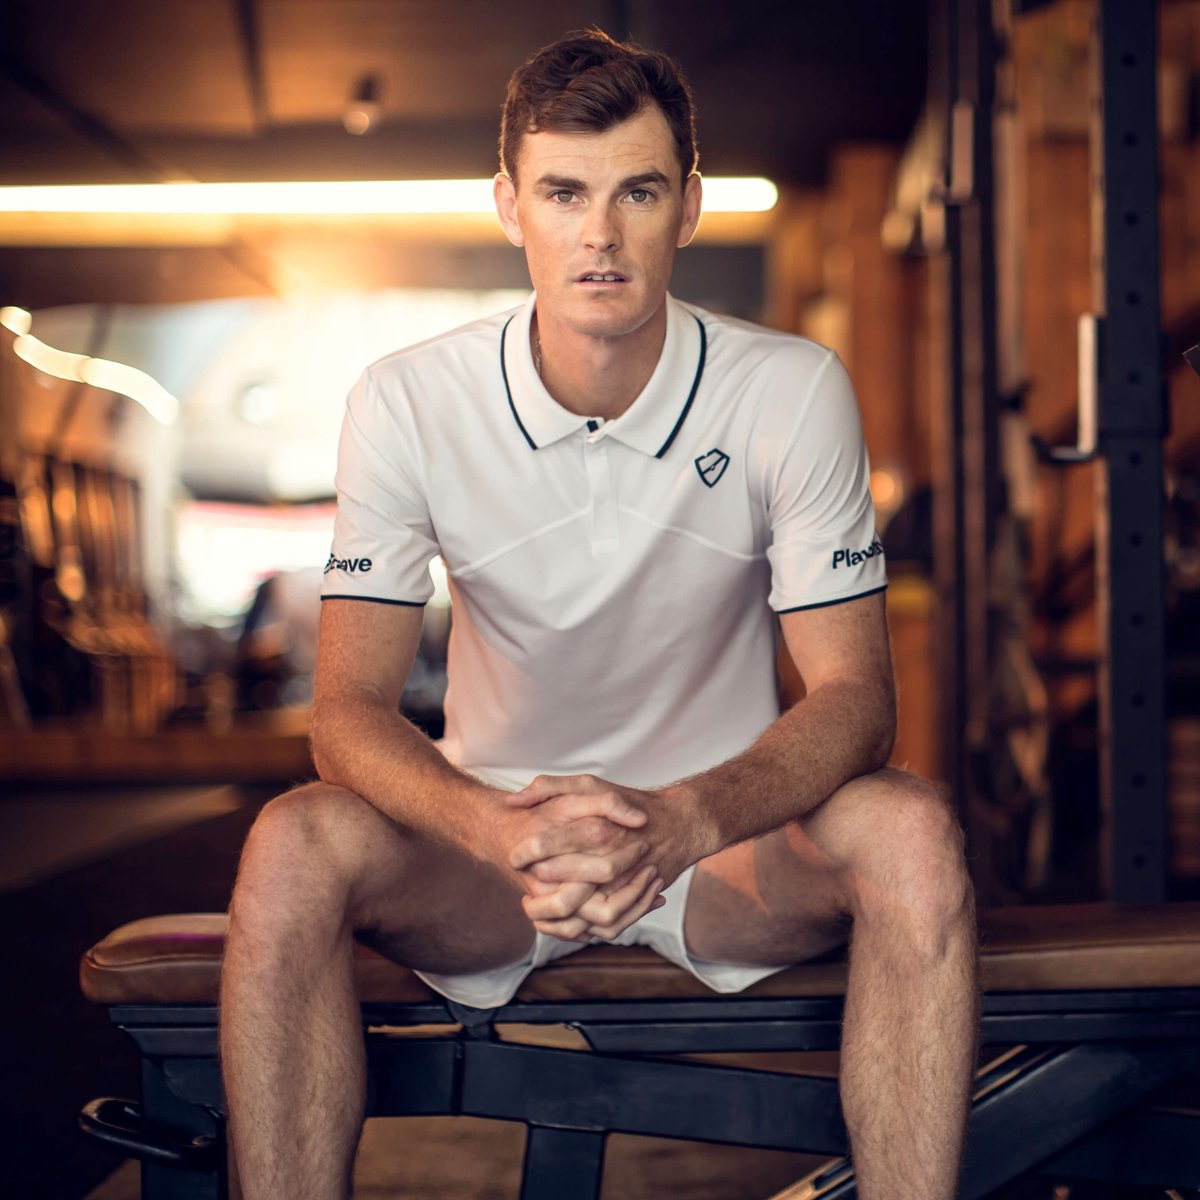 PlayBrave is honoured to announce Jamie Murray as our new Global Brand Ambassador. #playbrave #jamiemurray #TeamPB #tennis #champion